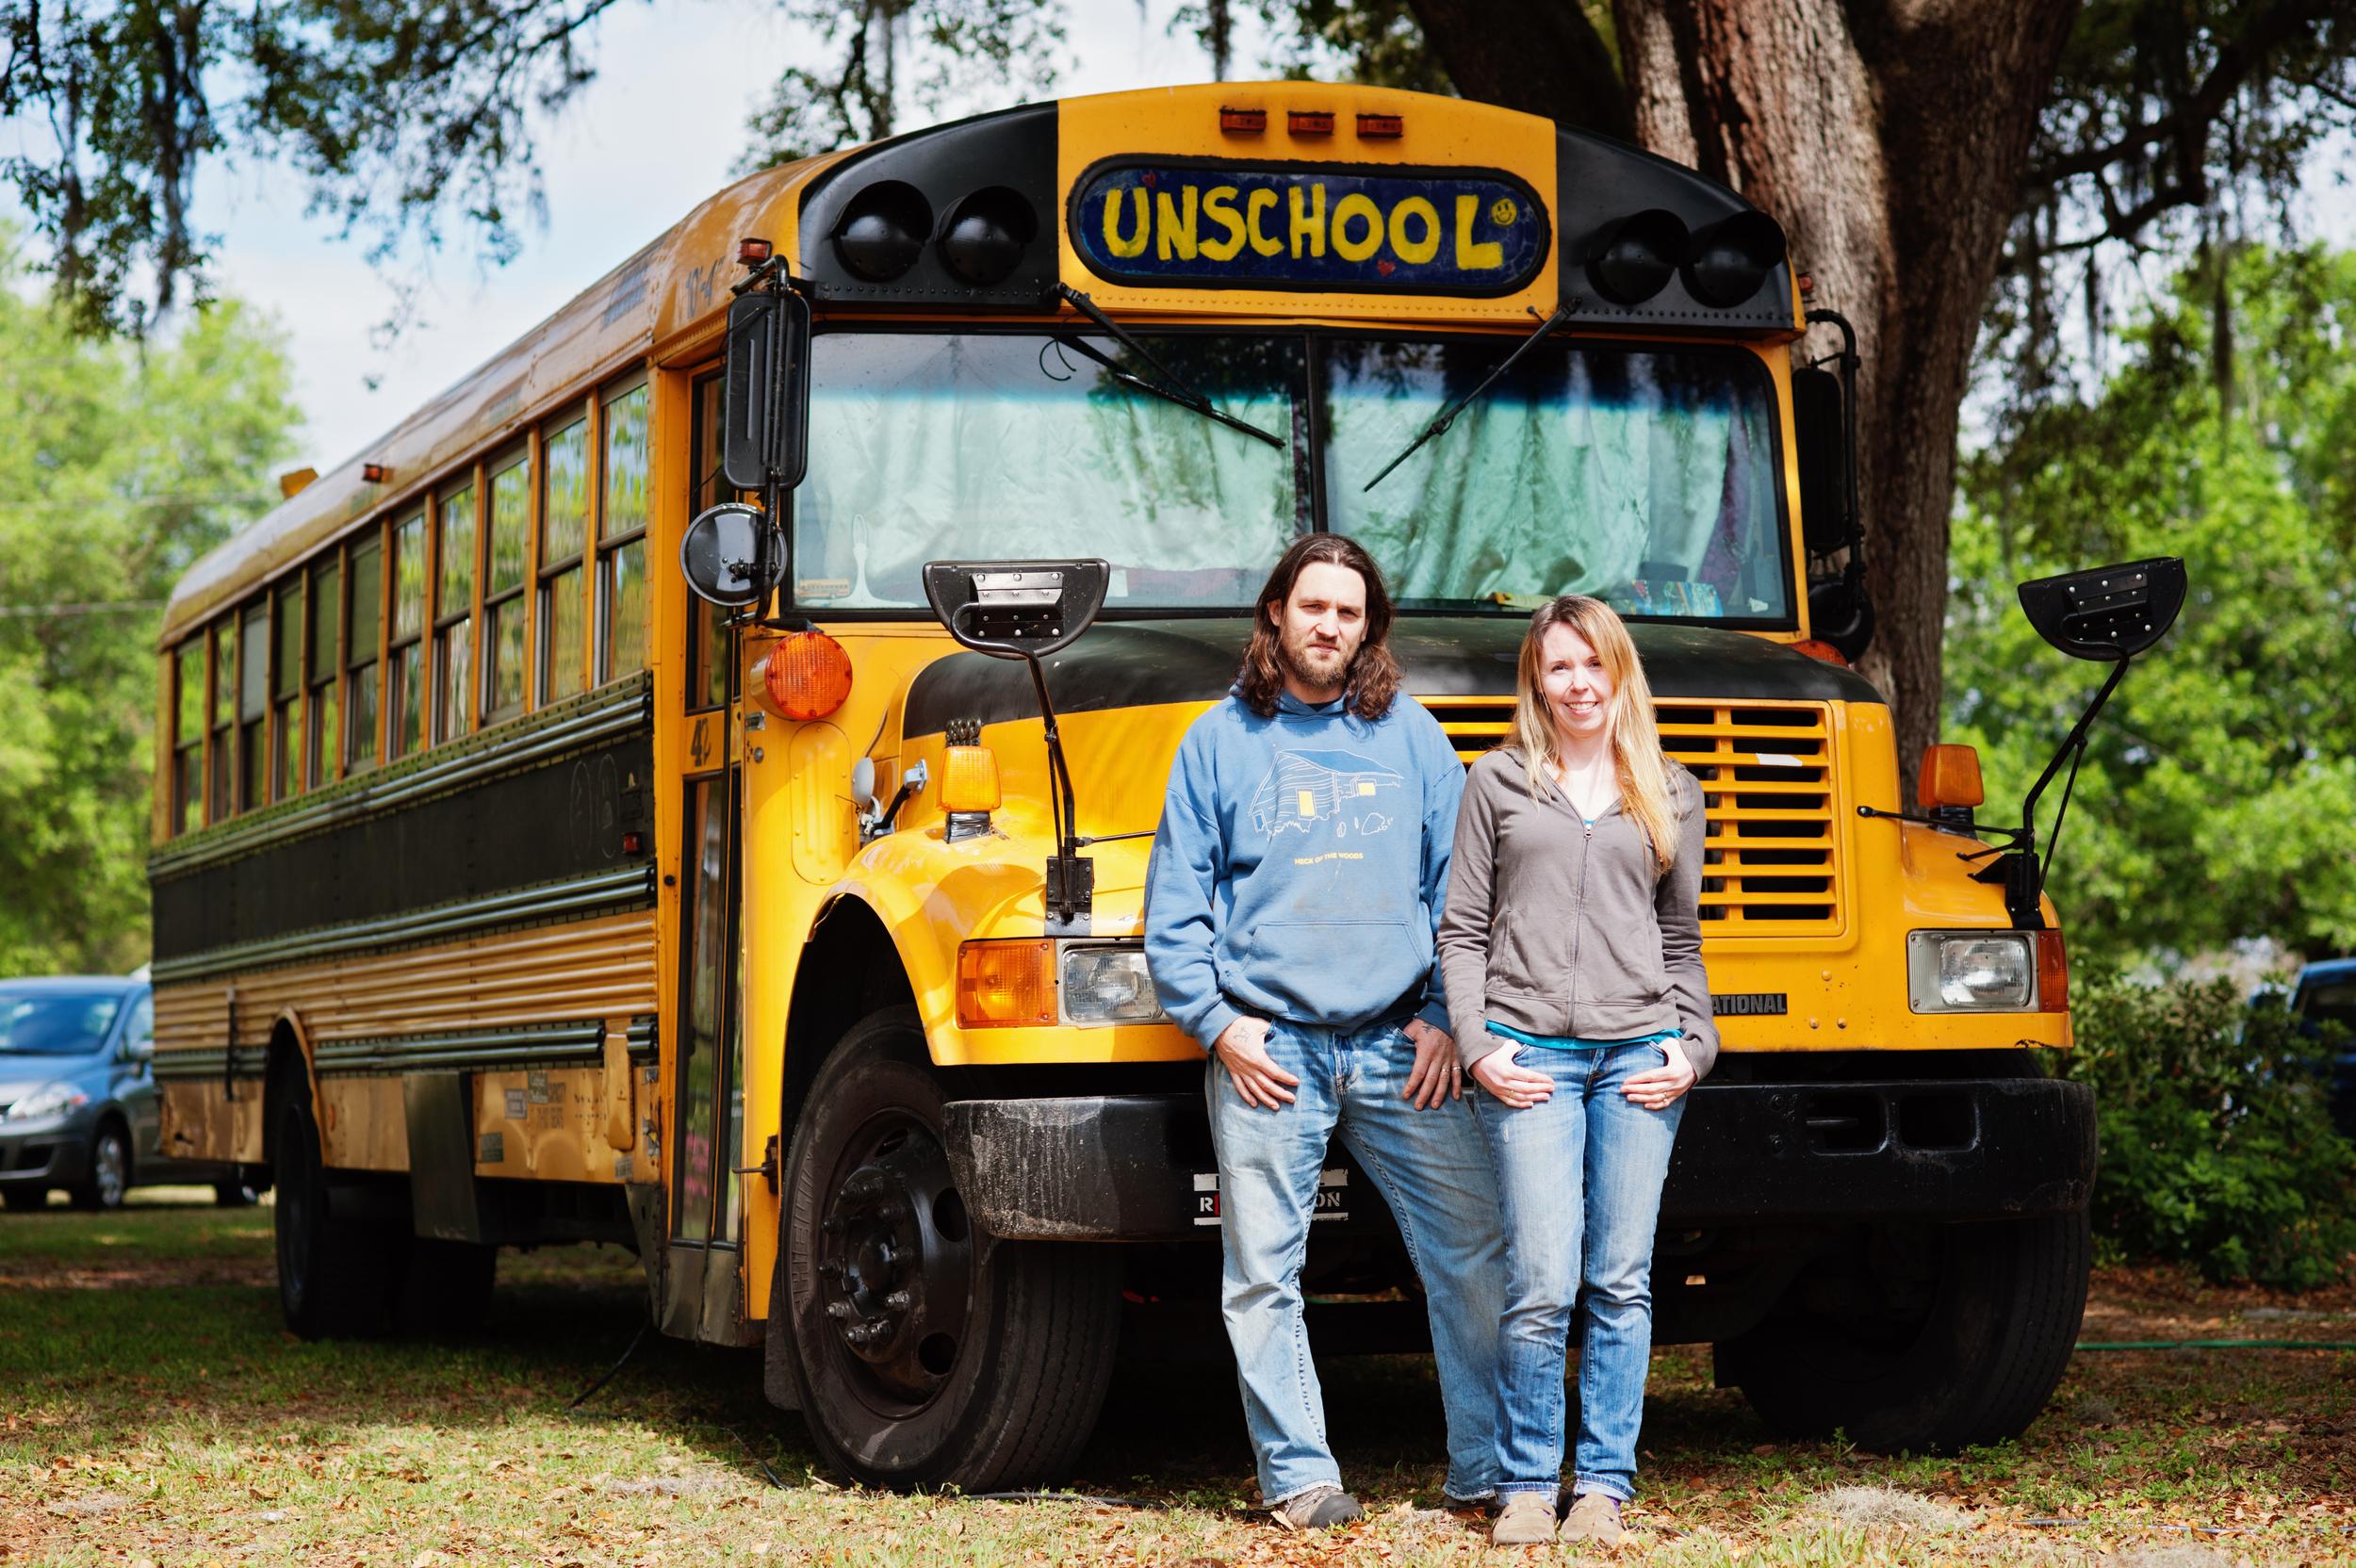 Jeff & Kelly Halldorson of The Unschool Bus   http://www.unschoolbus.com/